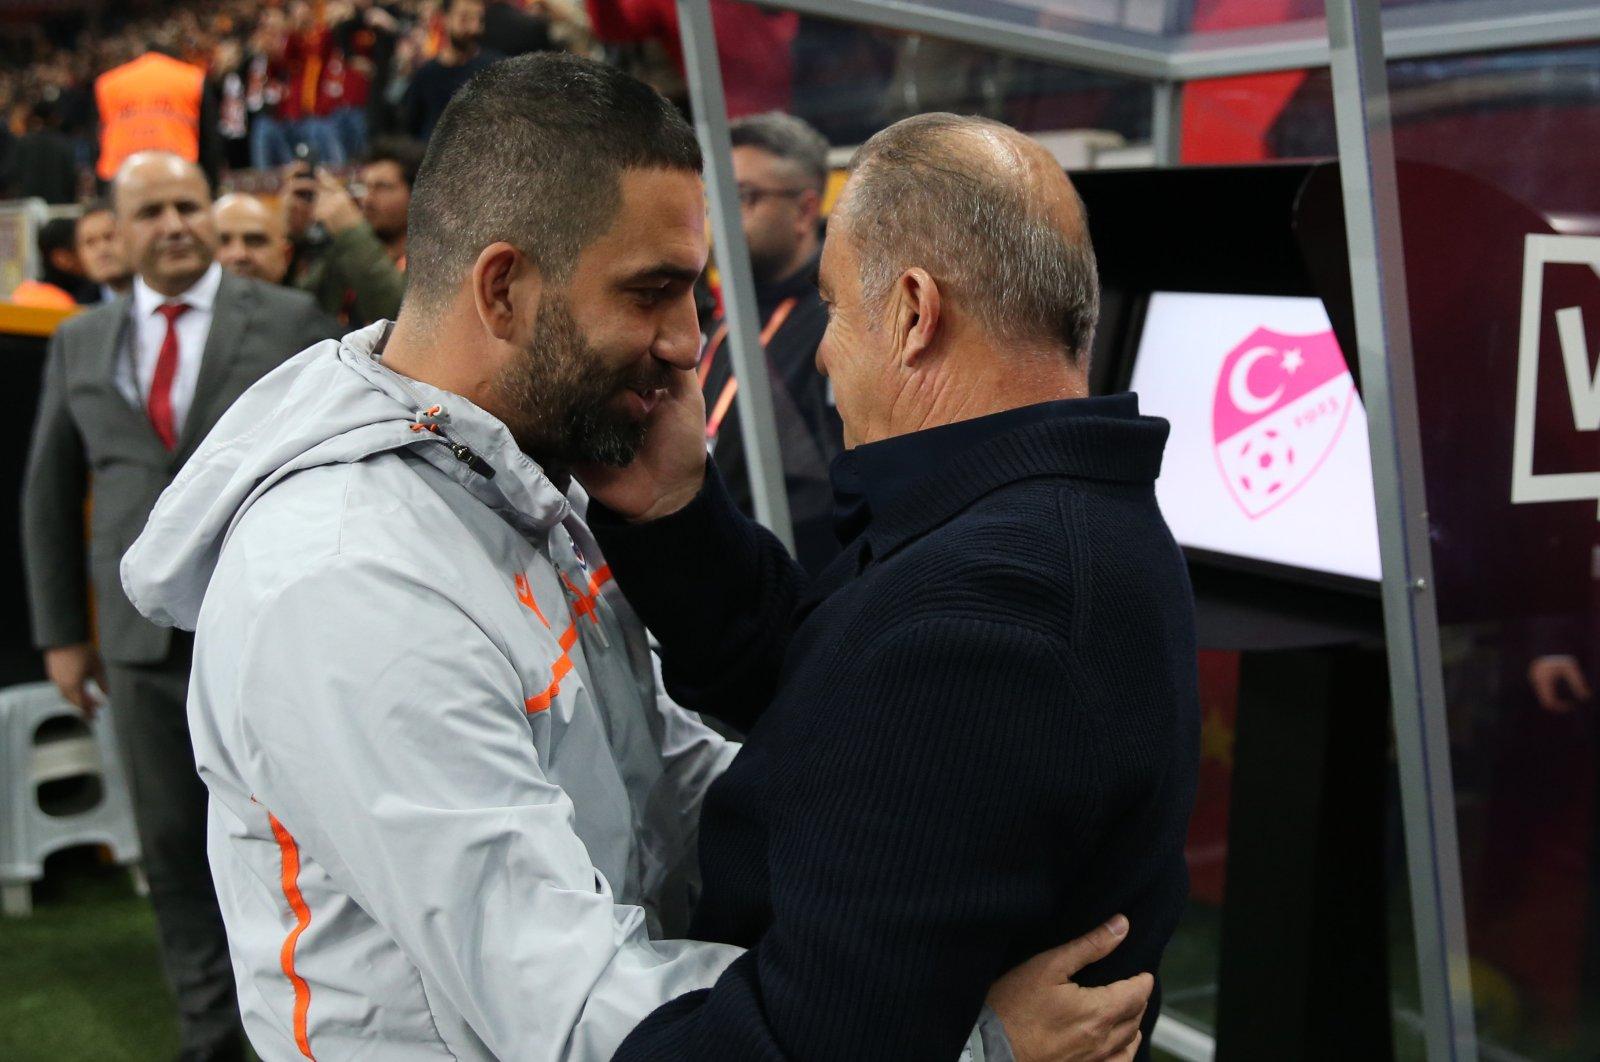 Arda Turan (L) and Galatasaray coach Fatih Terim embrace before a Süper Lig match between Başakşehir and Galatasaray in Istanbul, Turkey, Nov. 22, 2019. (AA Photo)